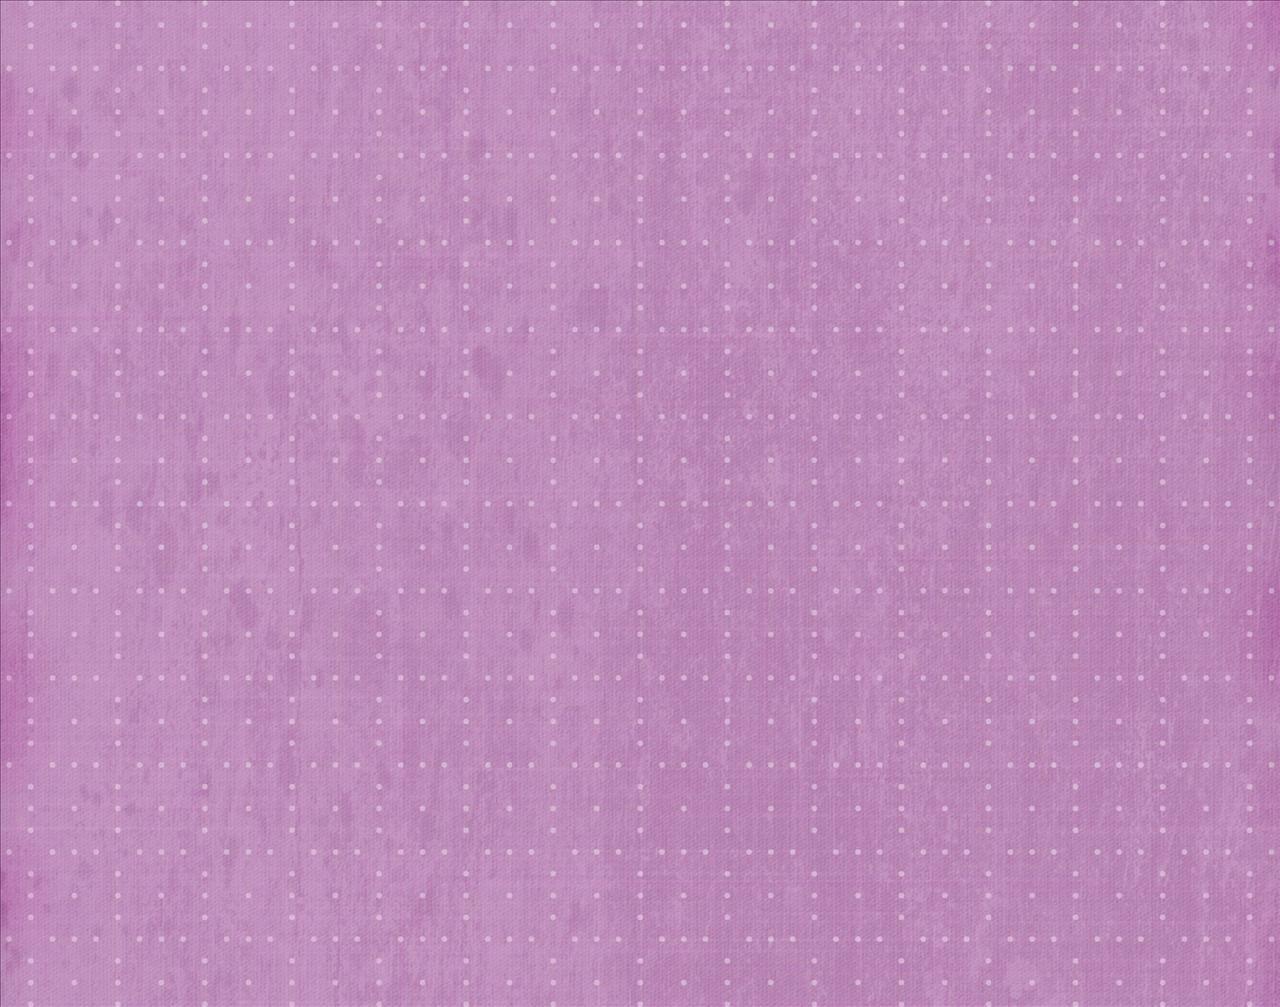 light purple wallpaper hd - photo #14